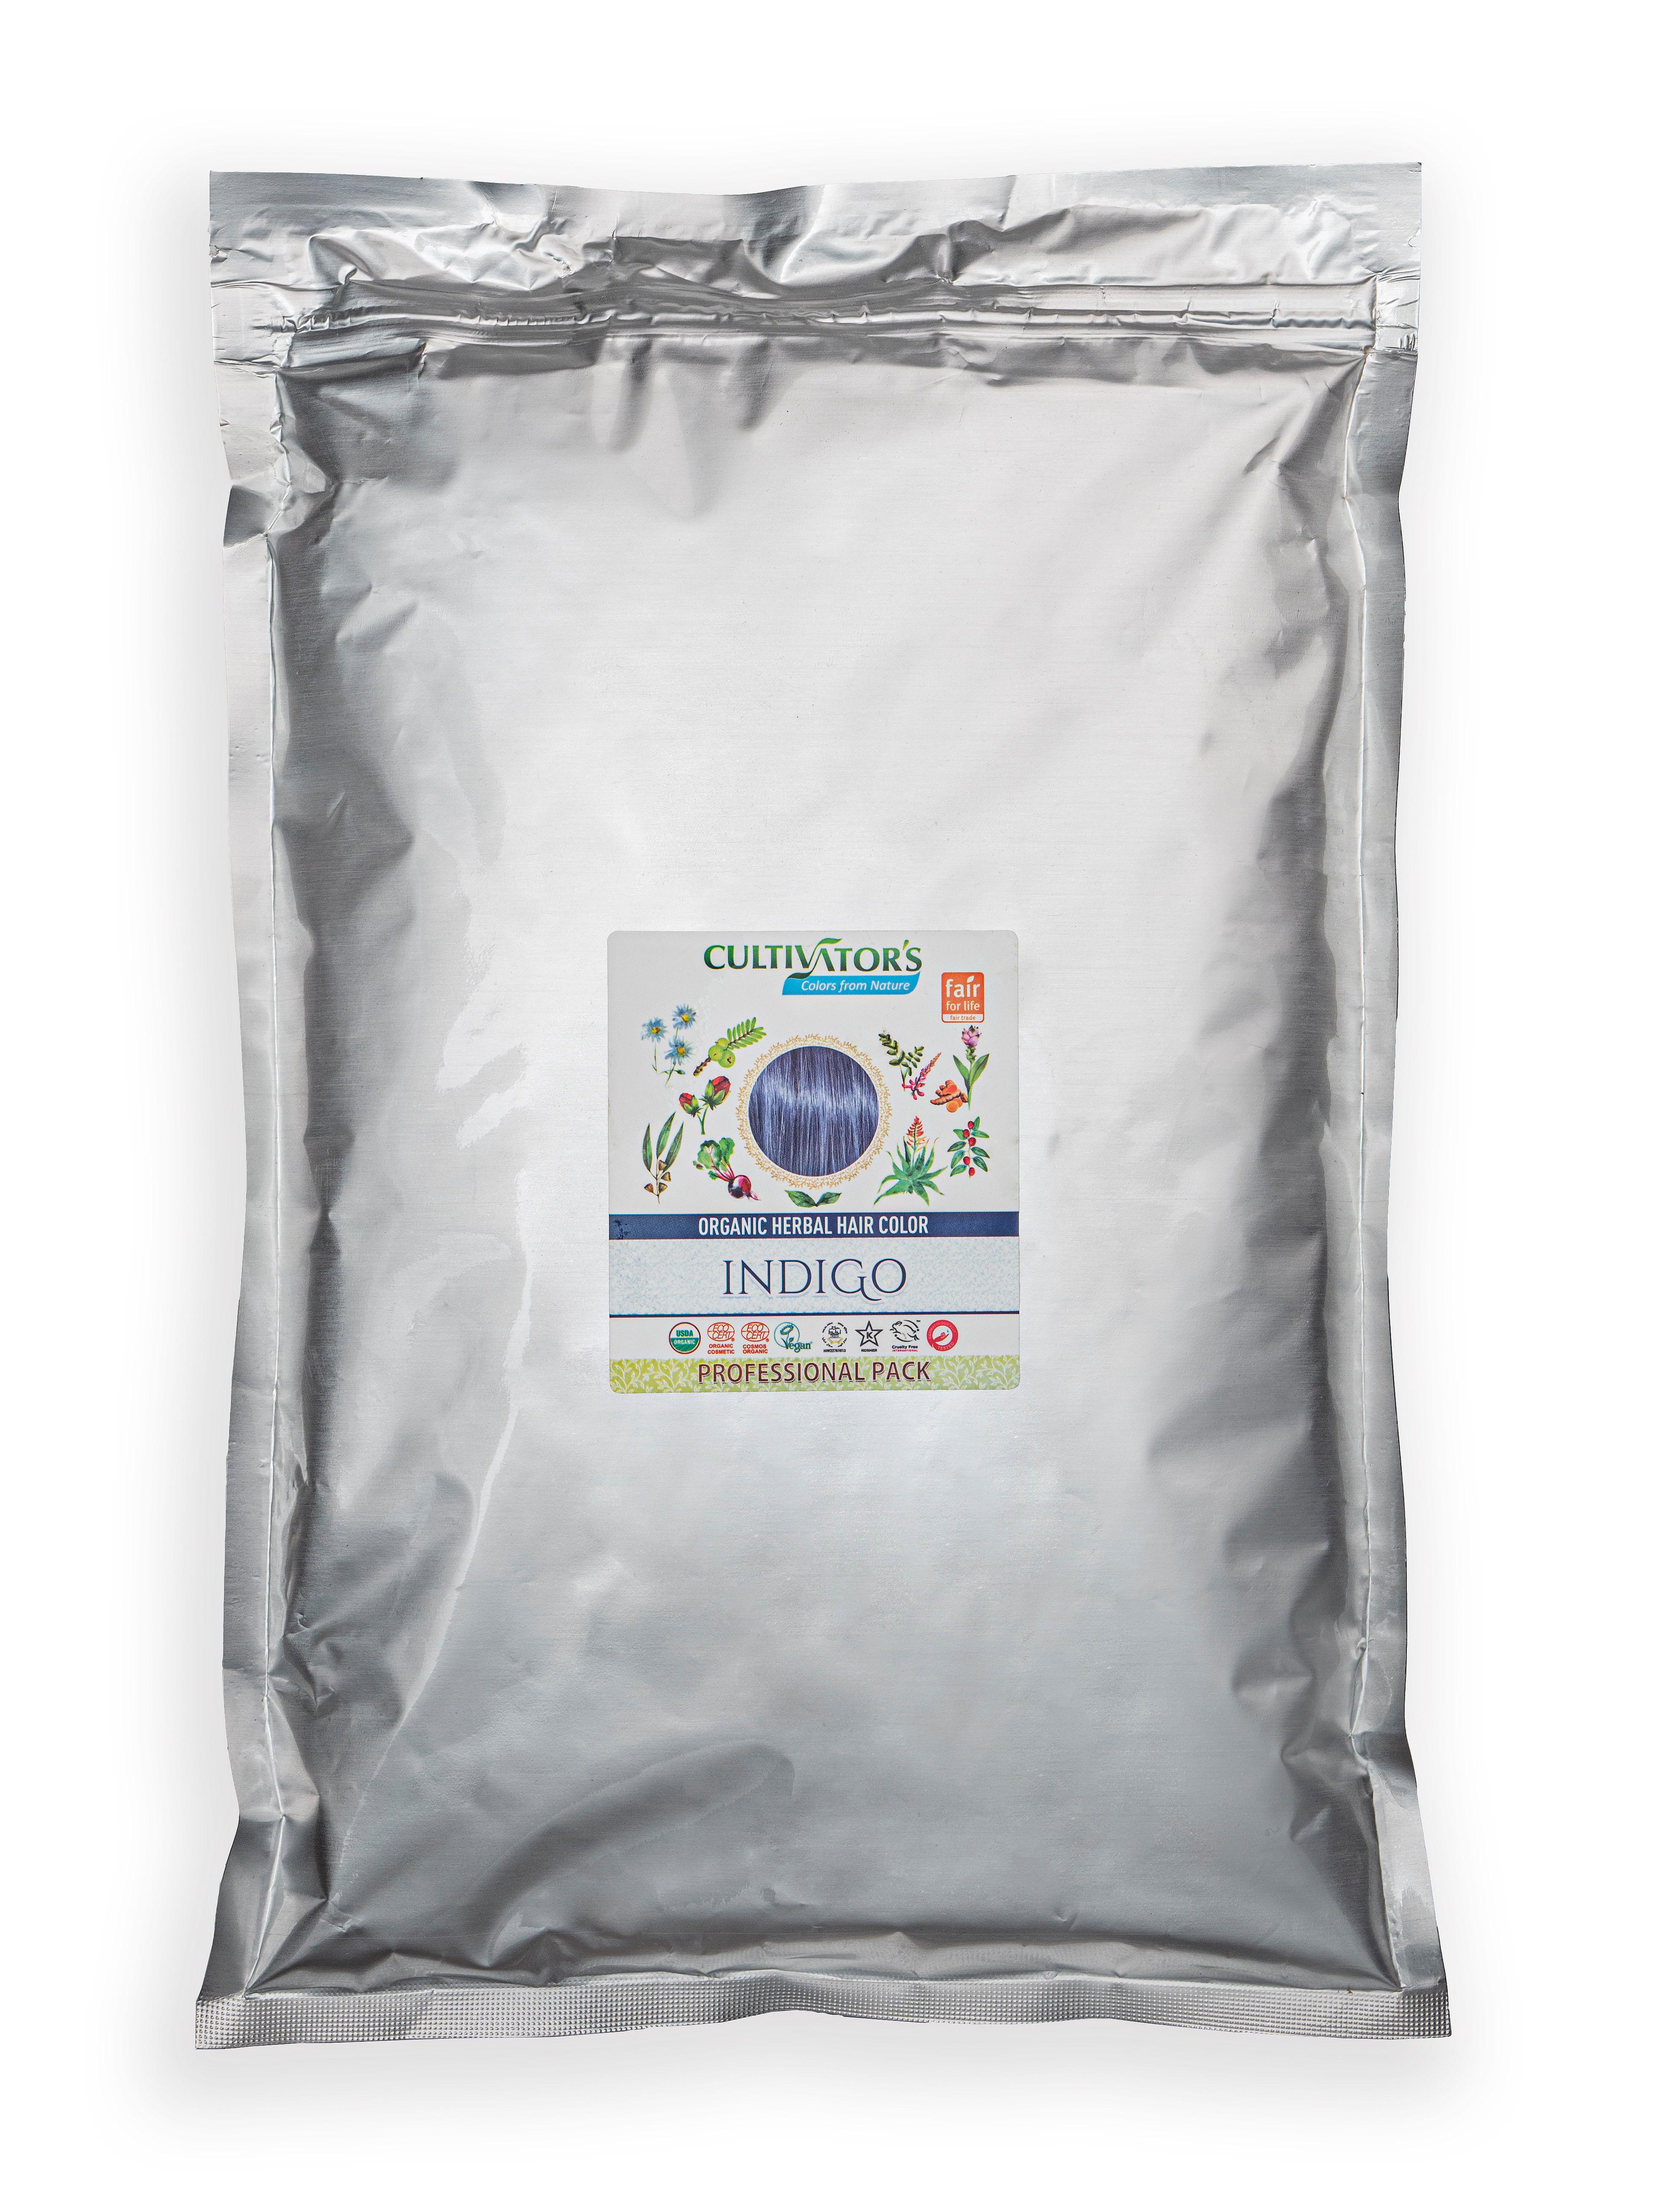 Cultivator's Hair Color-Indigo, 1kg